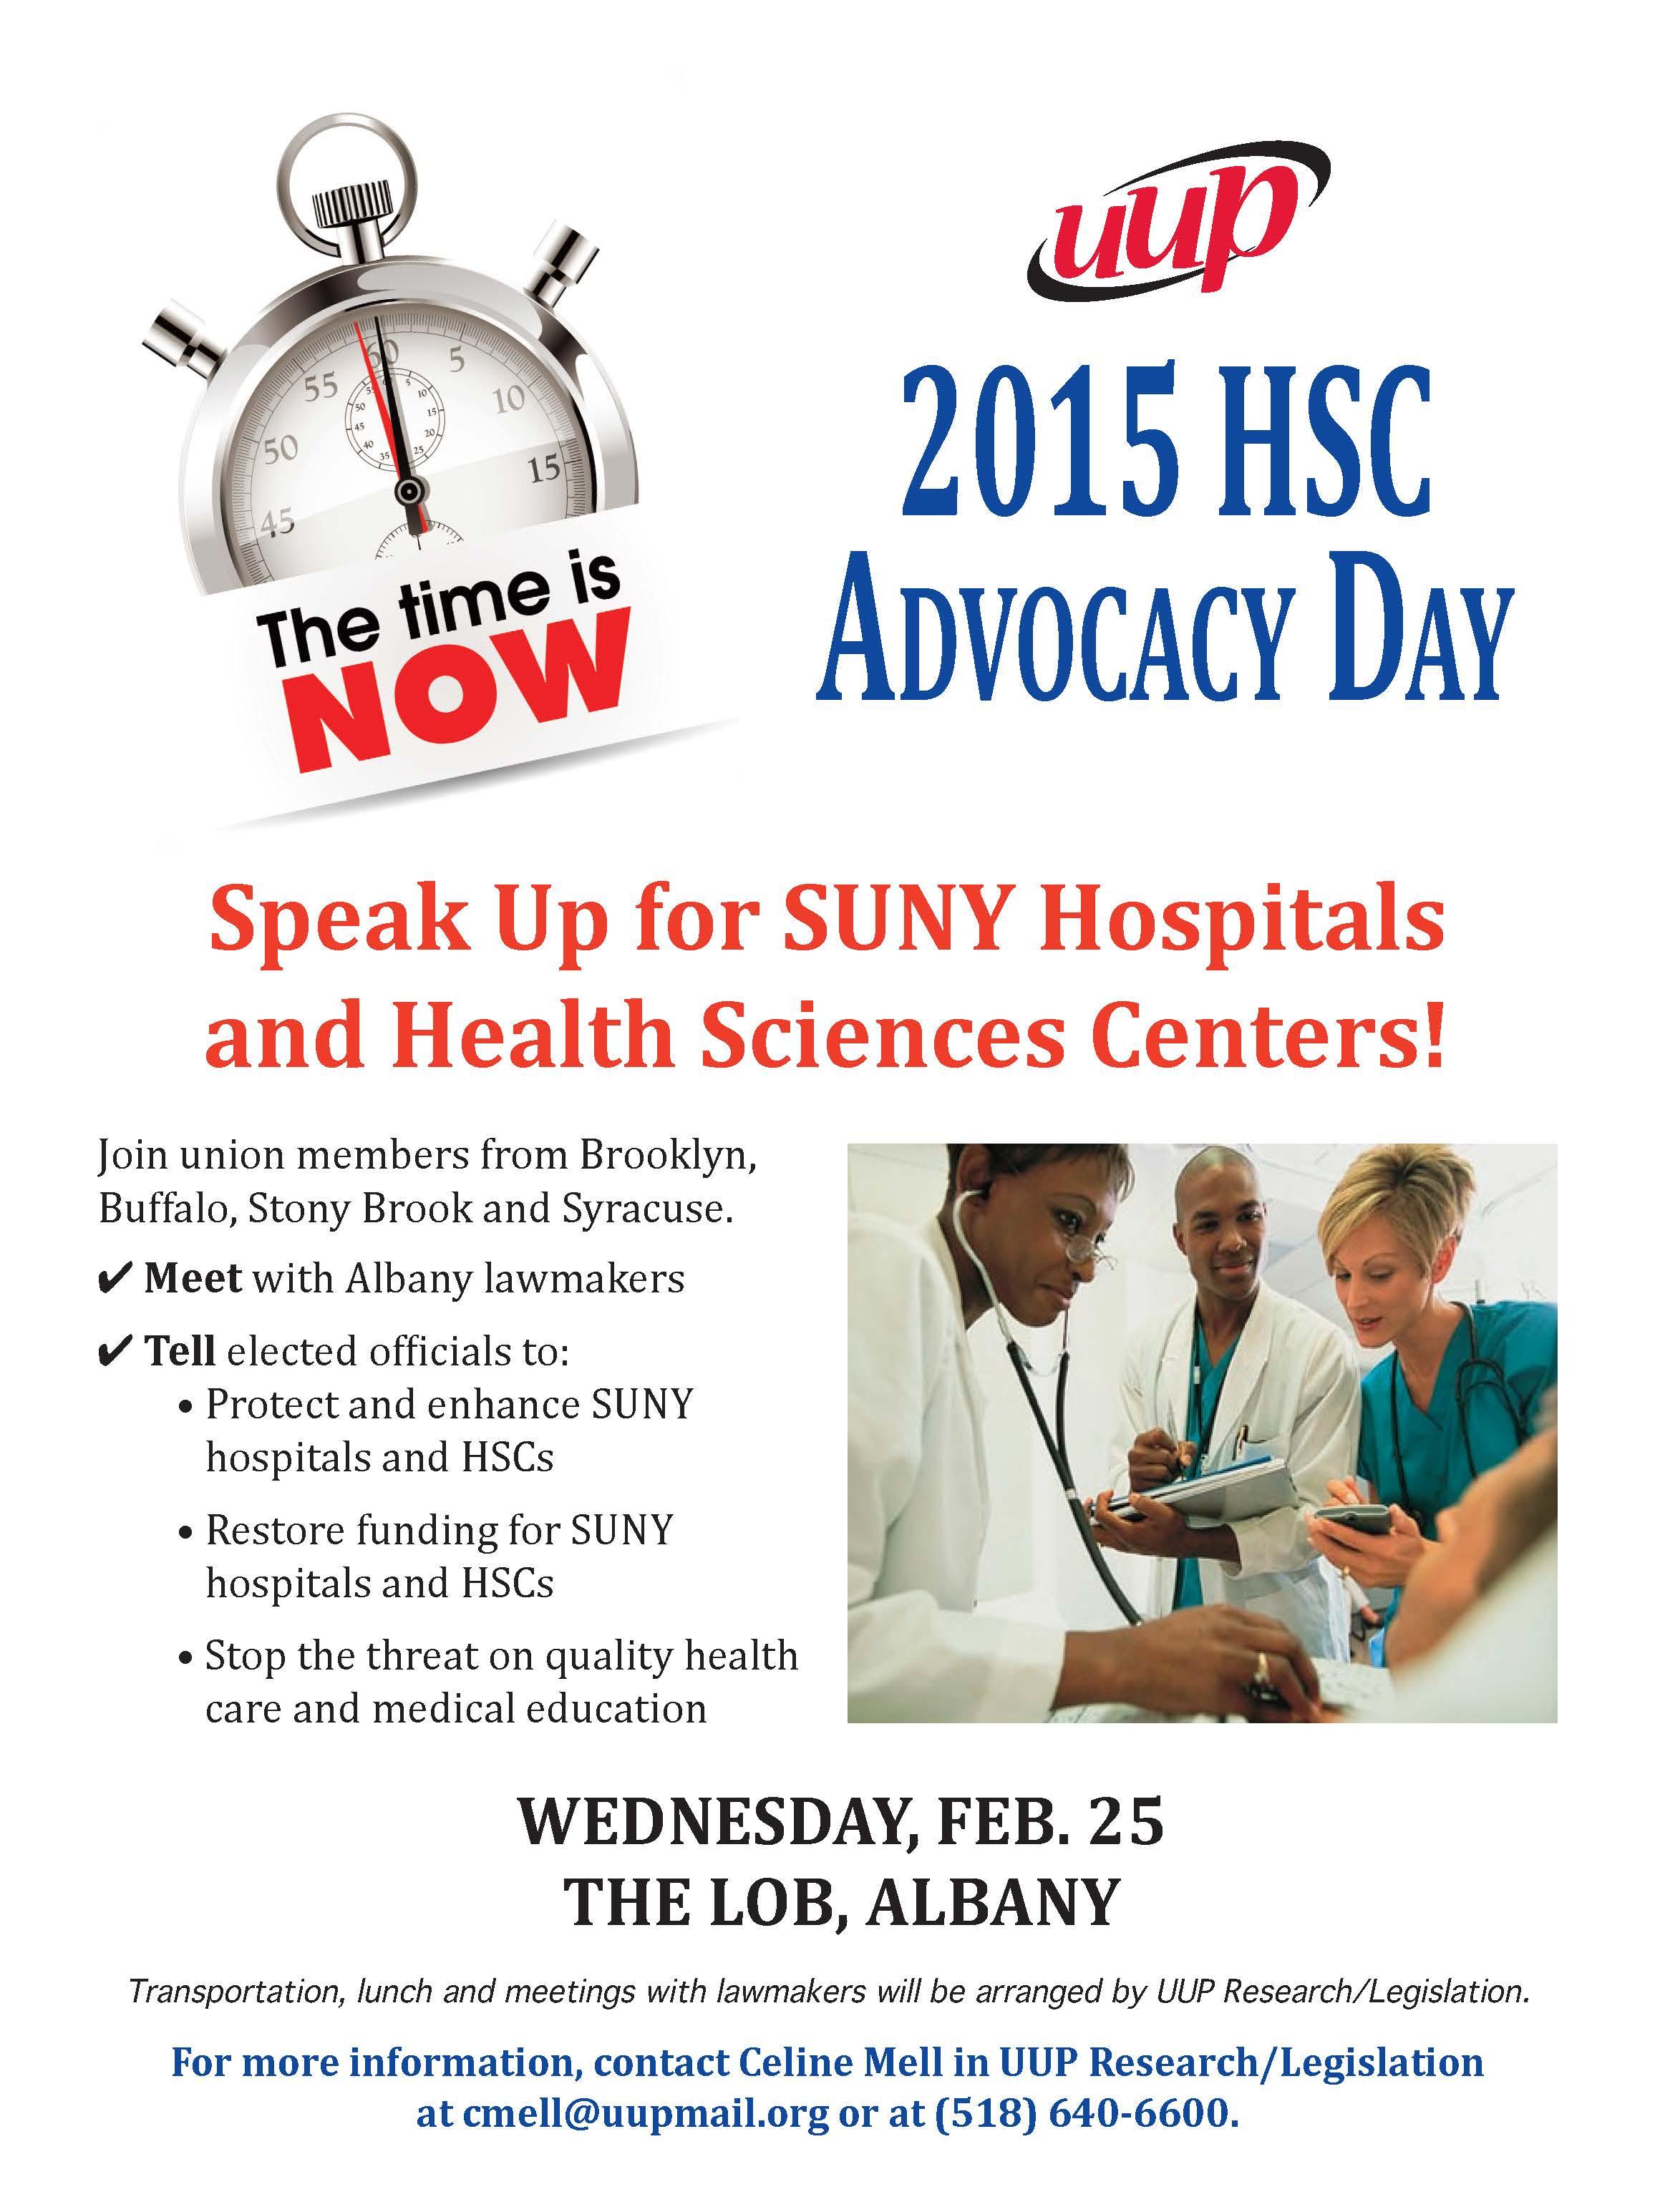 Sign up, speak up! Feb. 25 HSC Advocacy day